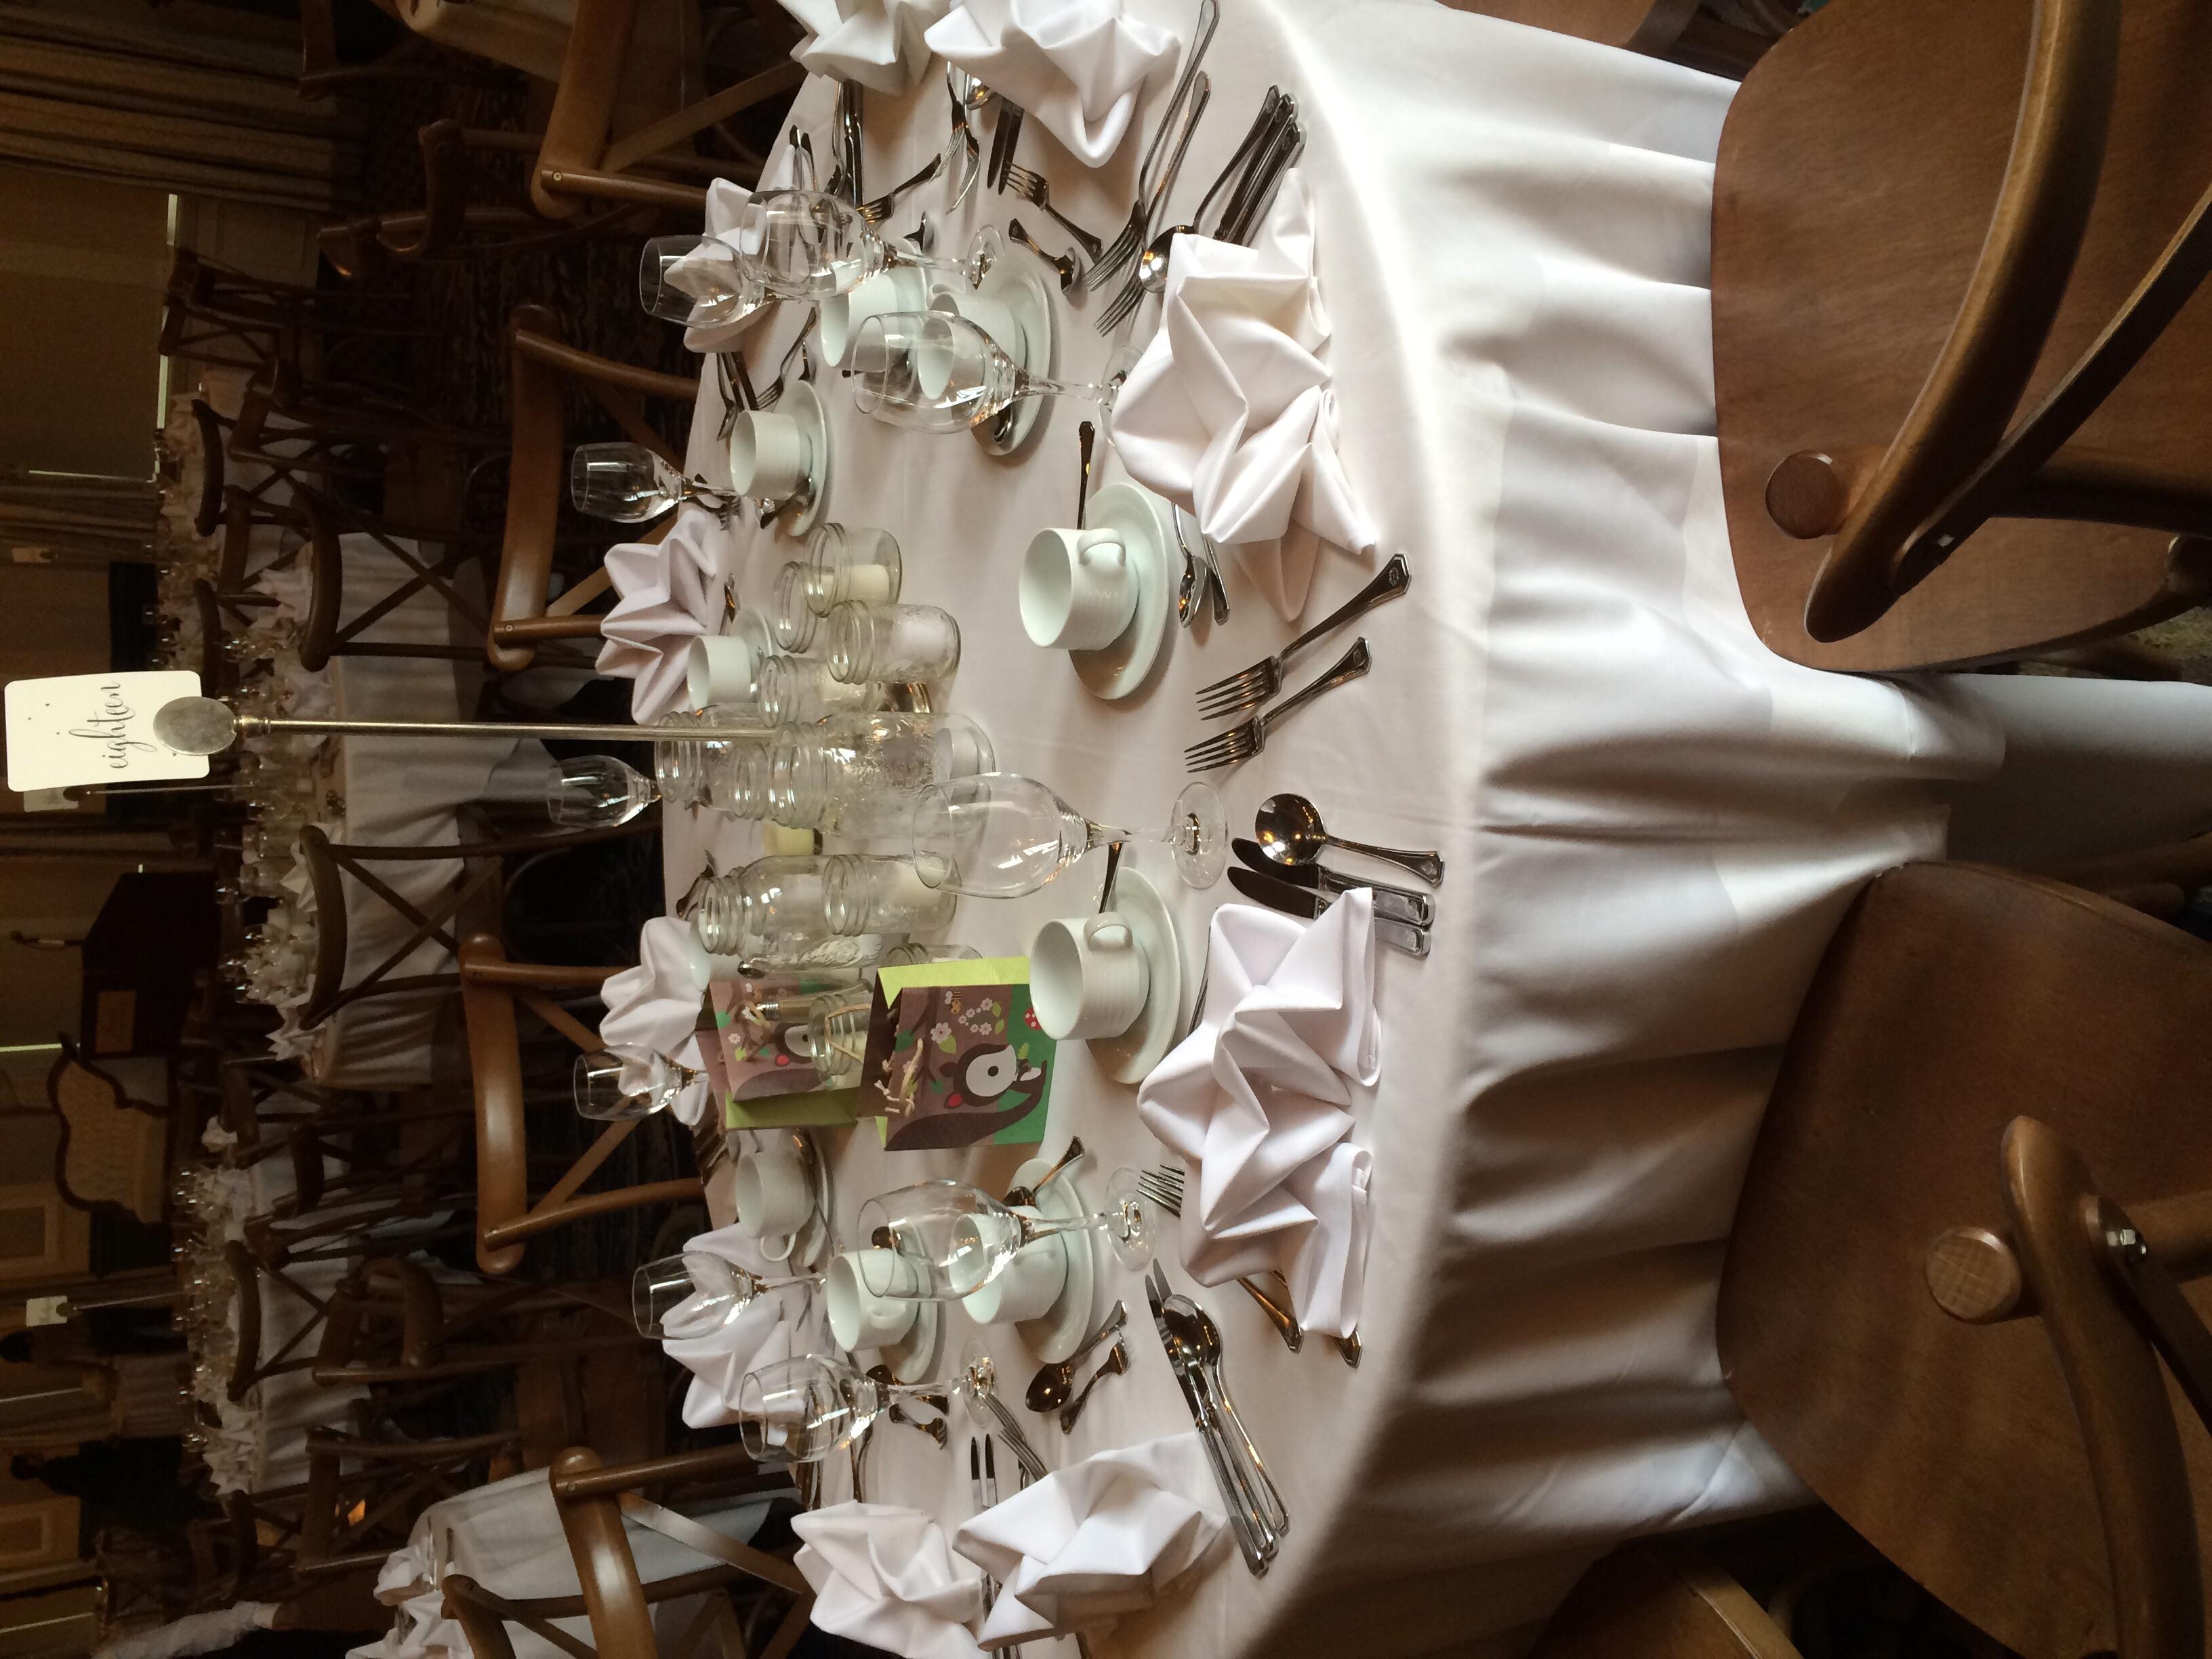 Nin and Vip chose simple tabletop decor, using mason jars to hold beautiful candlelight.